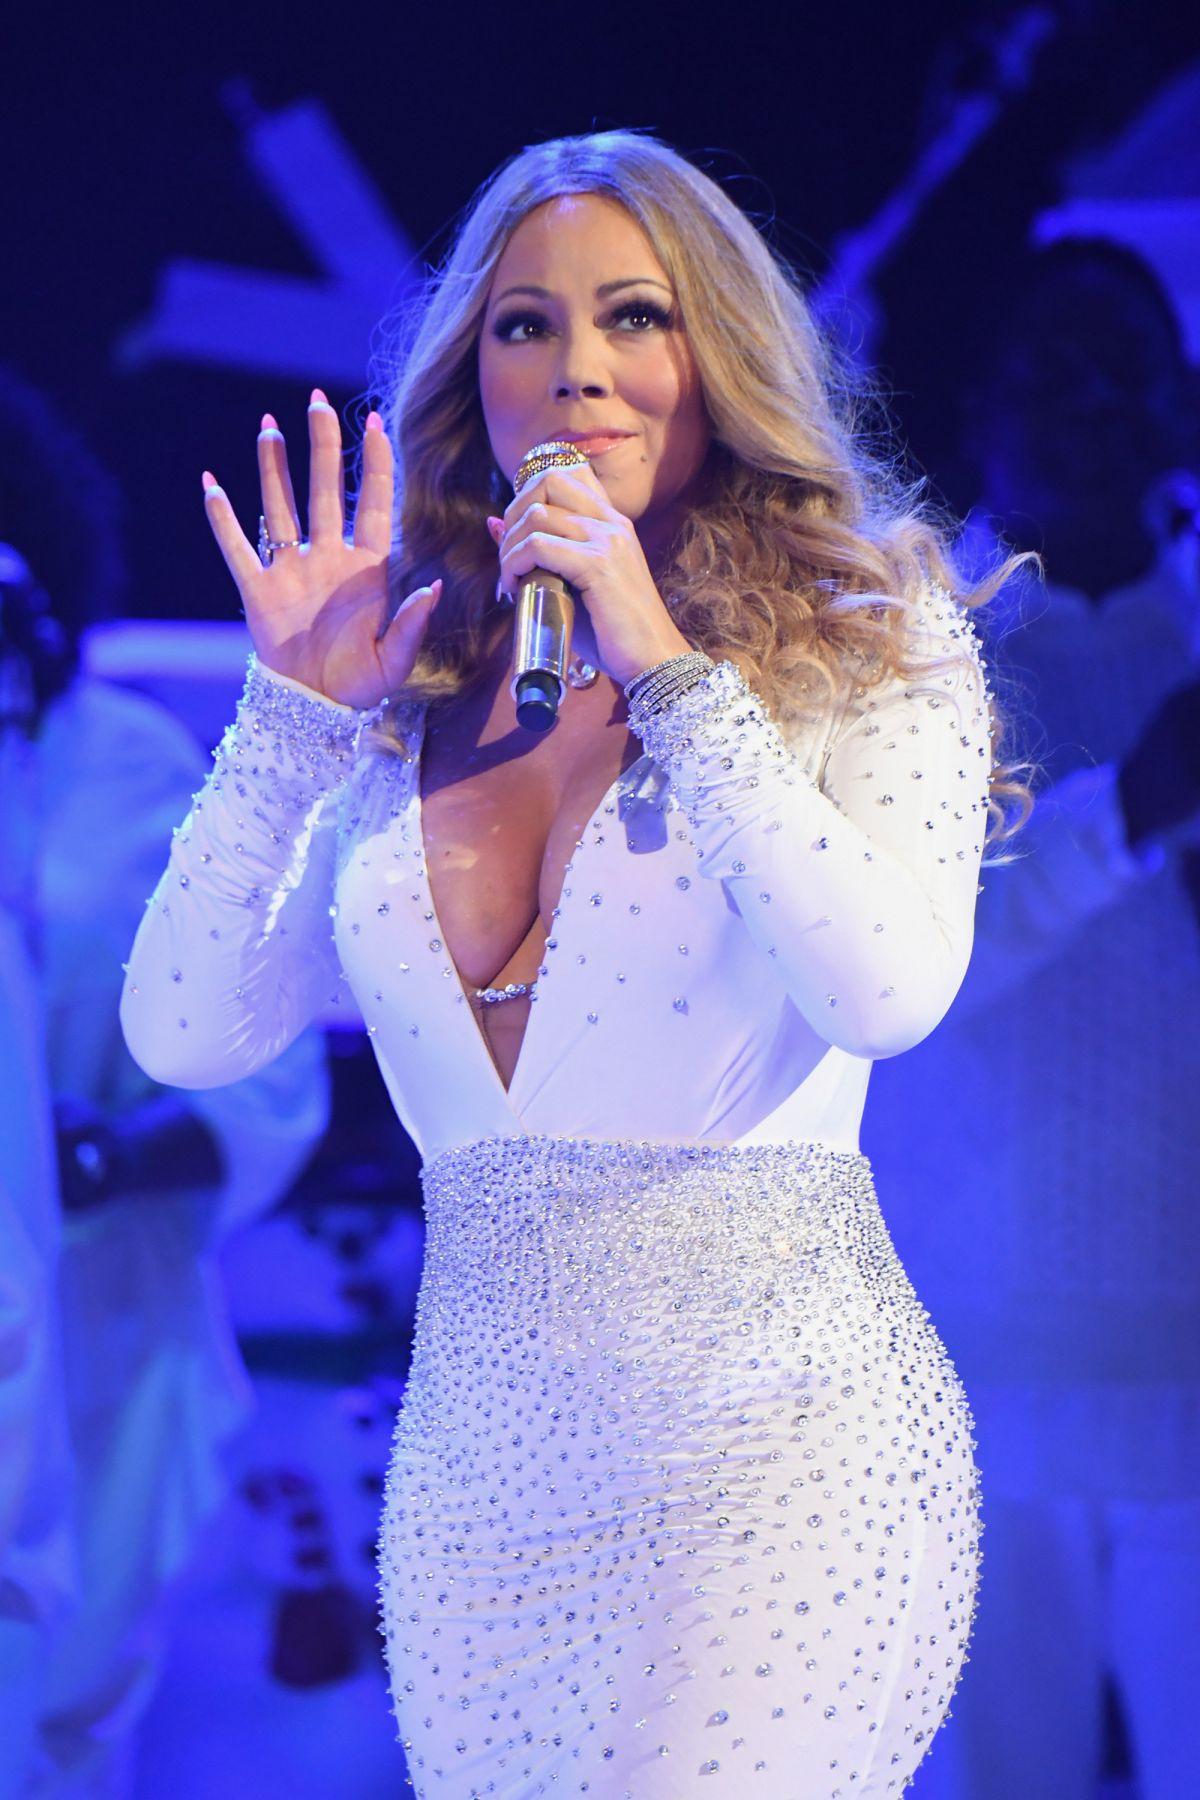 Mariah Carey Christmas Tour 2020 Beacon Theatre Mariah Carey Christmas Show 2020 Ford | Nffnnb.newyear2020happy.info